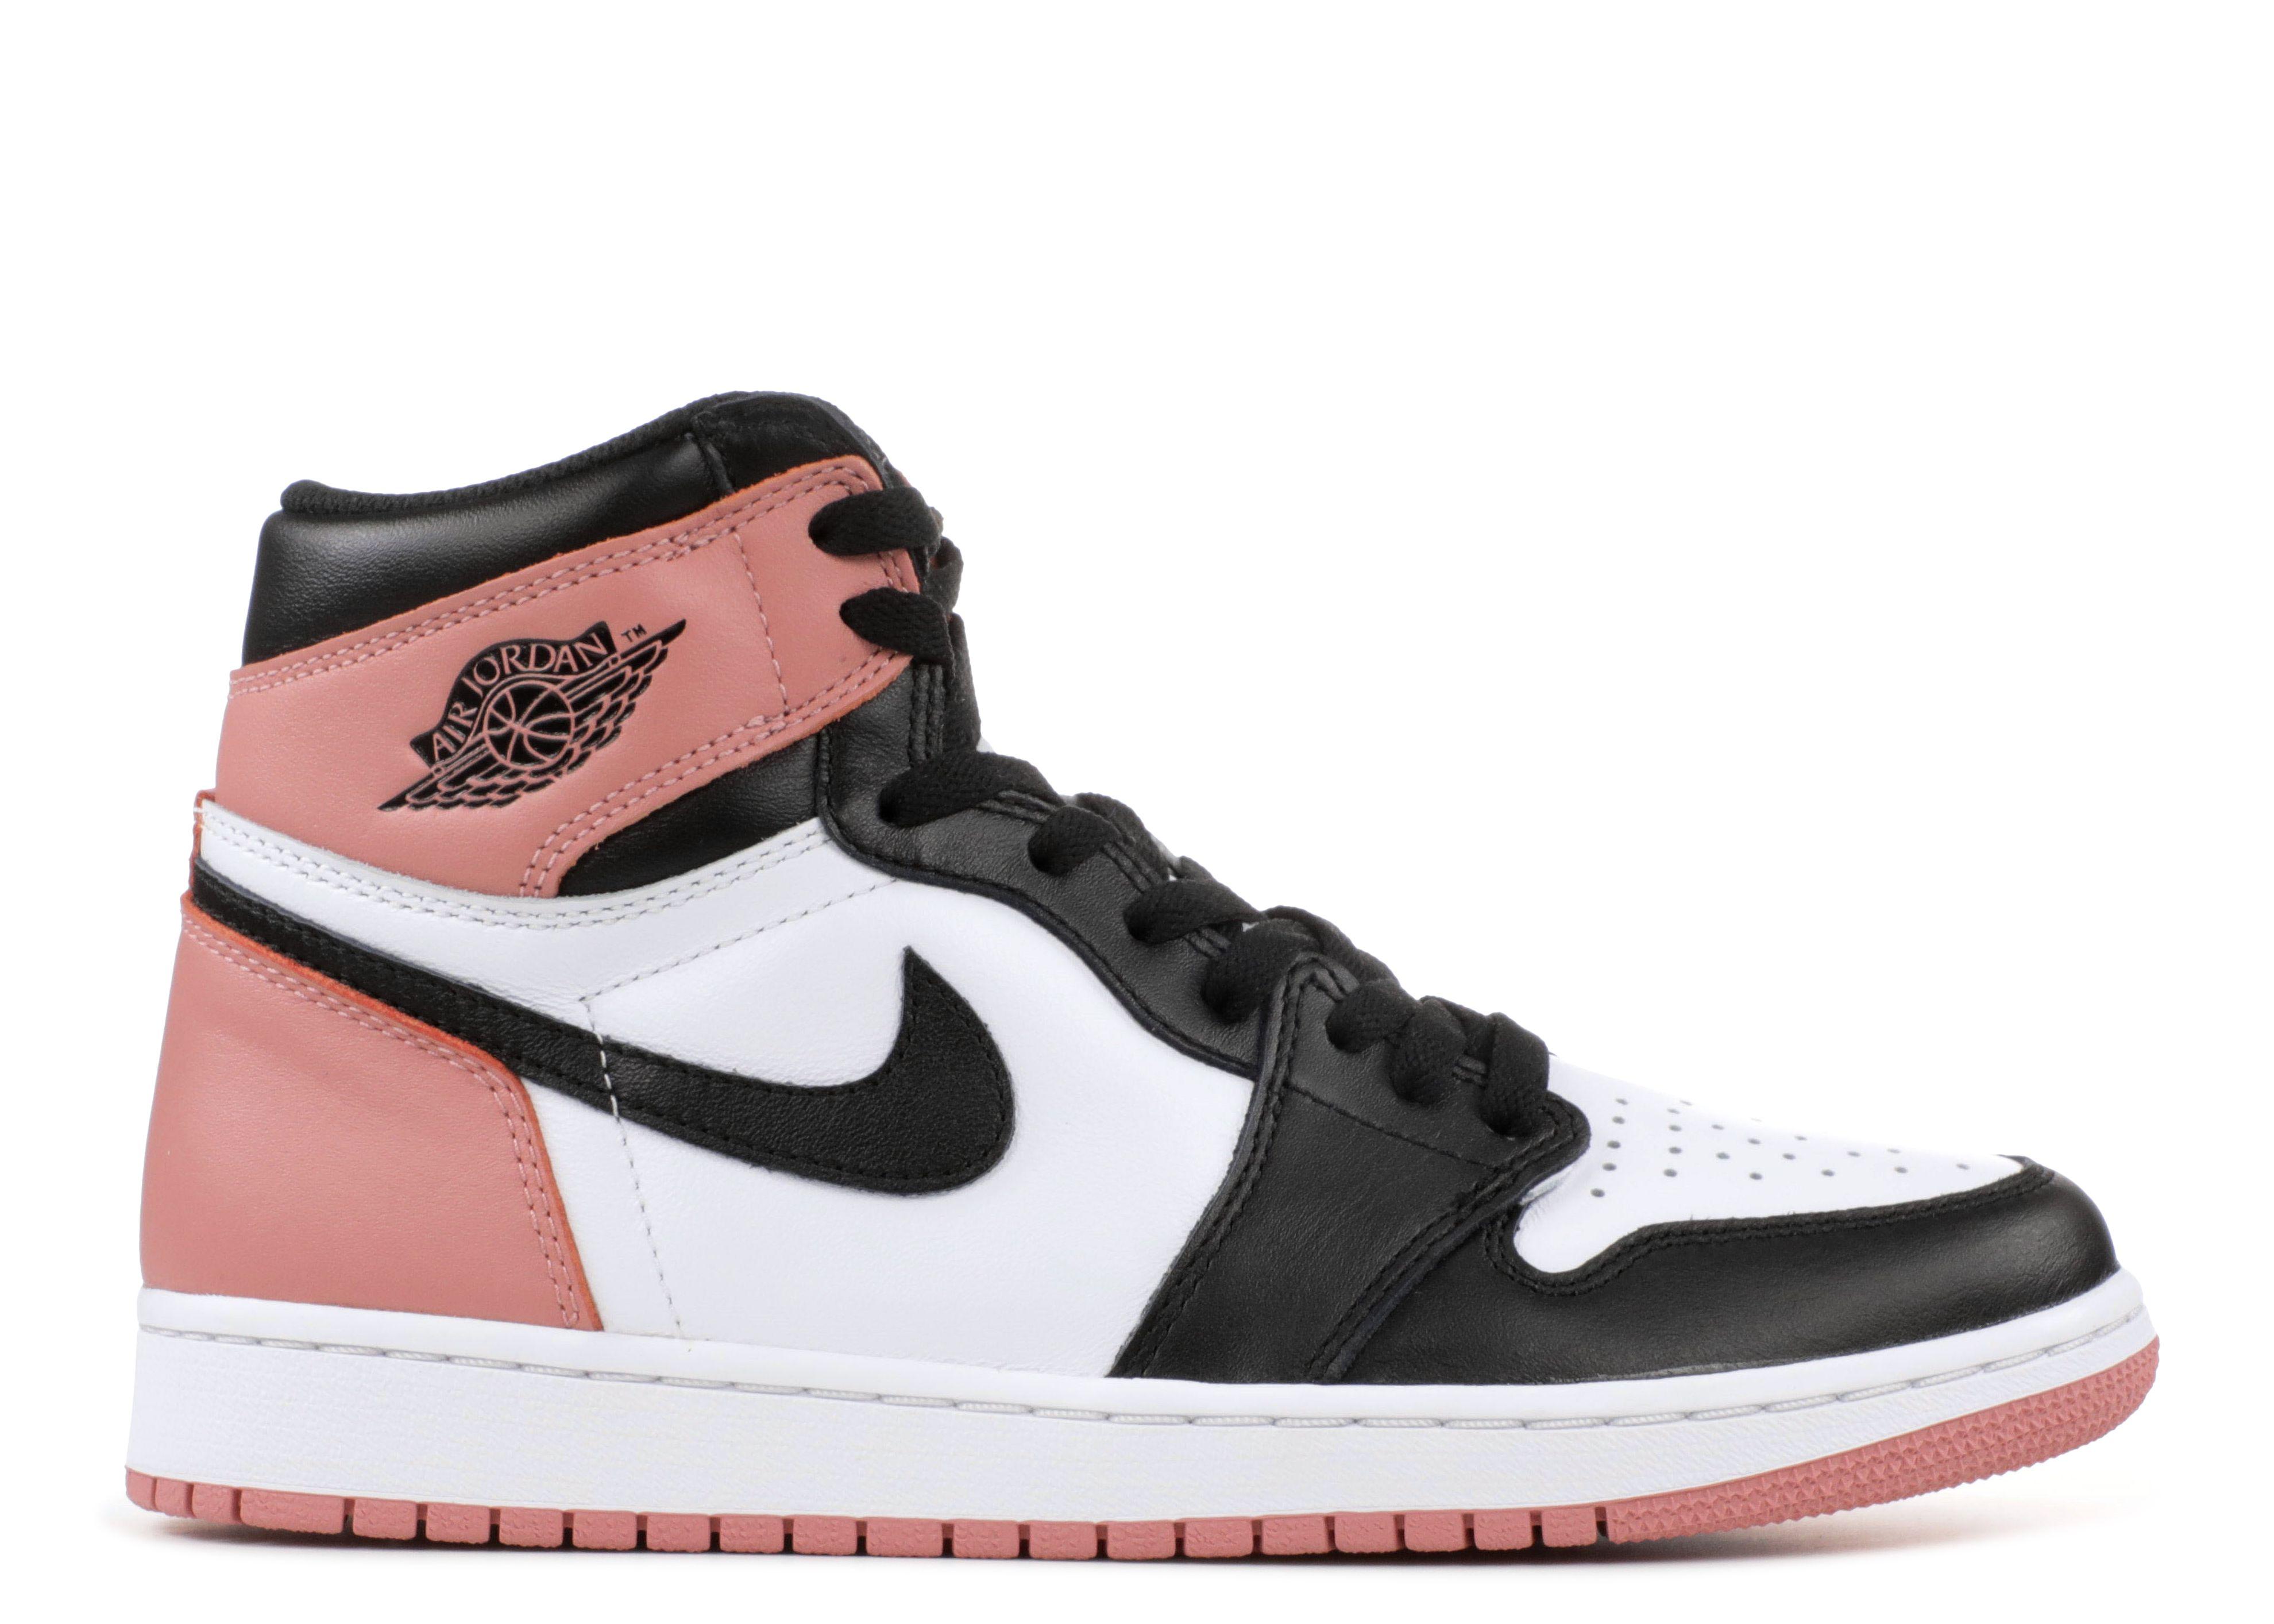 pink and black retro jordans